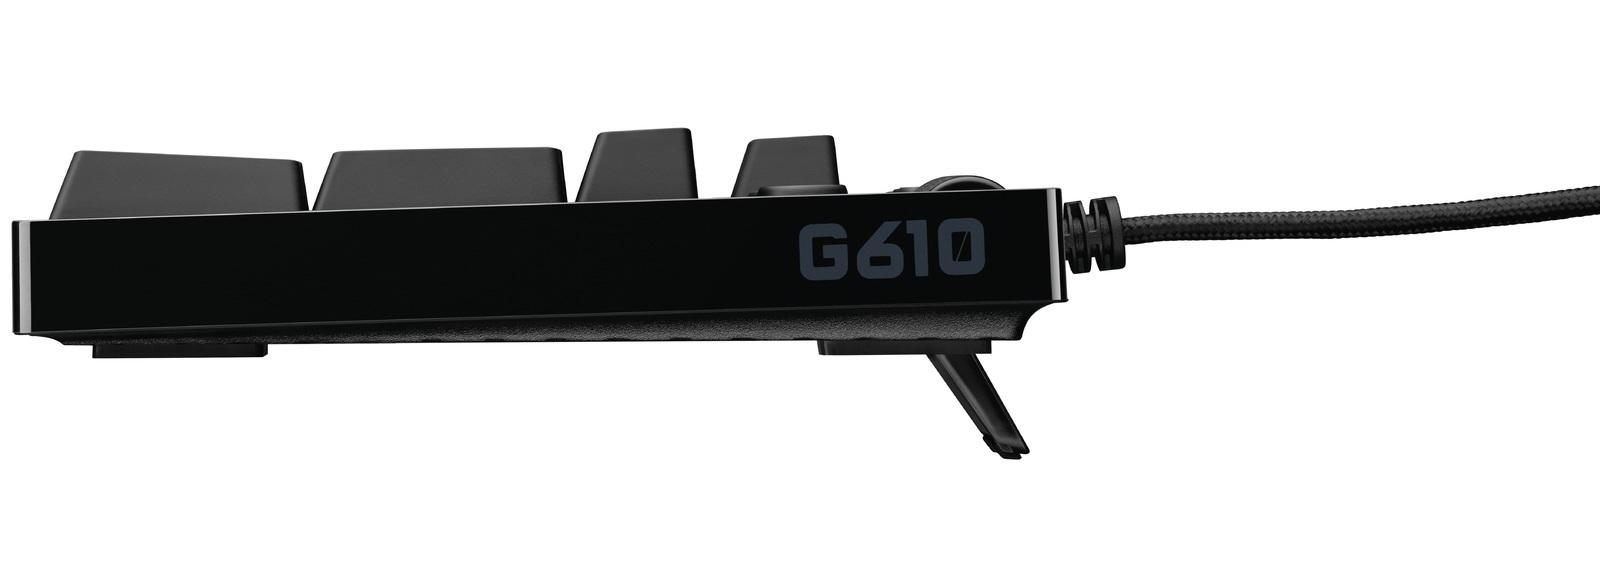 Logitech G610 Backlit Mechanical Keyboard (Cherry MX Blue) for  image